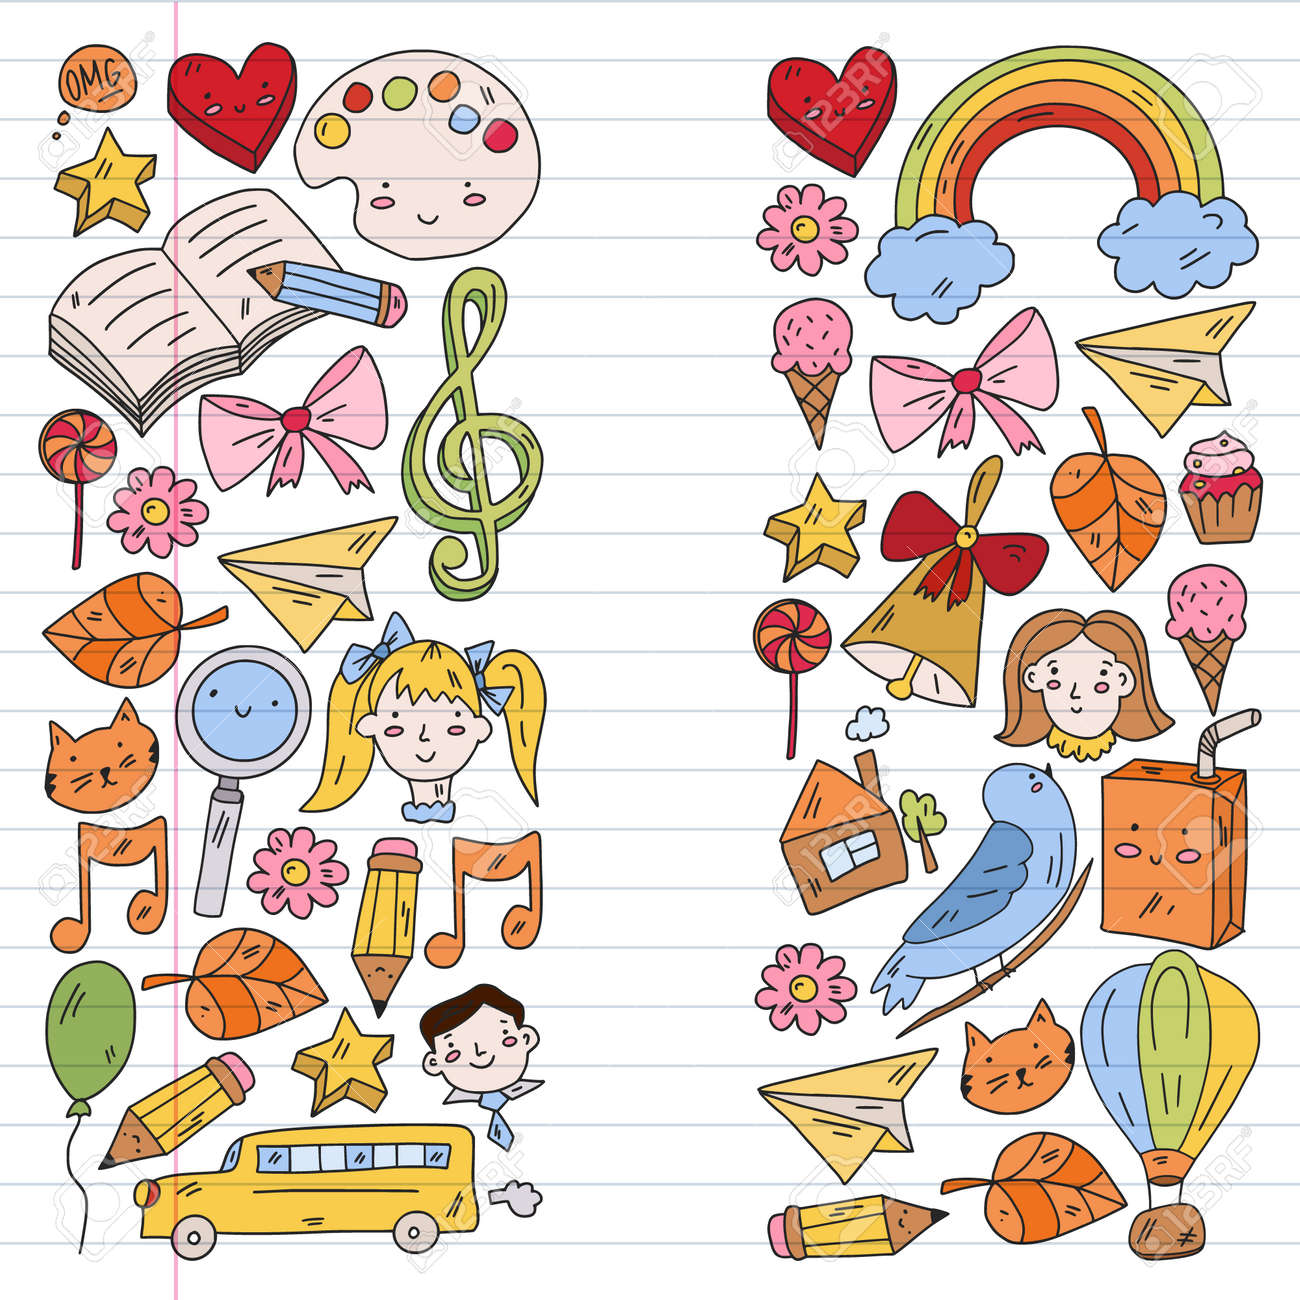 School, kindergarten with cute vector children. Creativity and imagination. Dancing, singing, painting, online education. - 173370383